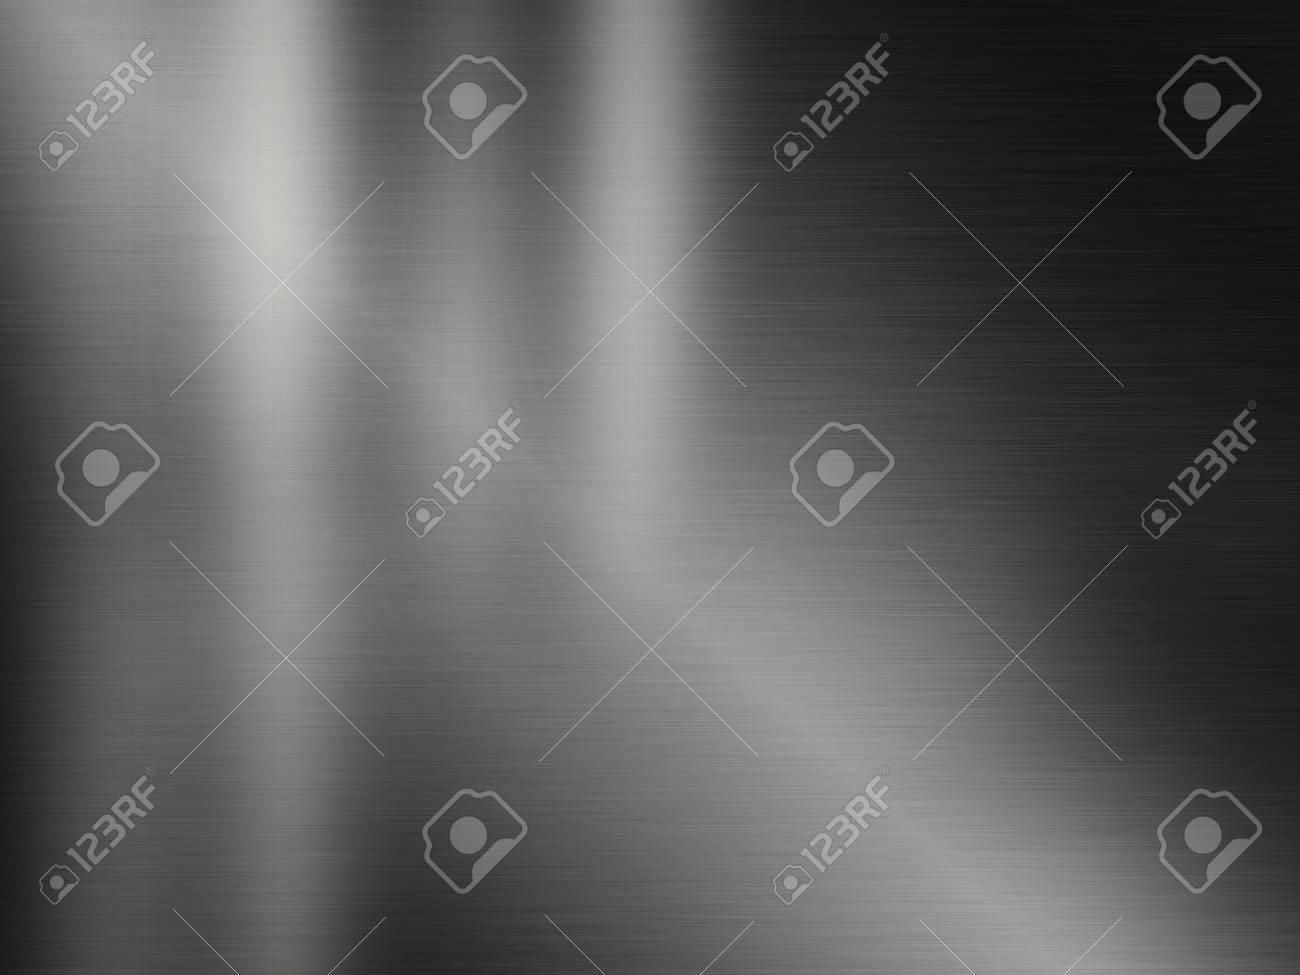 texture en acier inoxydable ou en métal texture de fond Banque d'images - 75076759